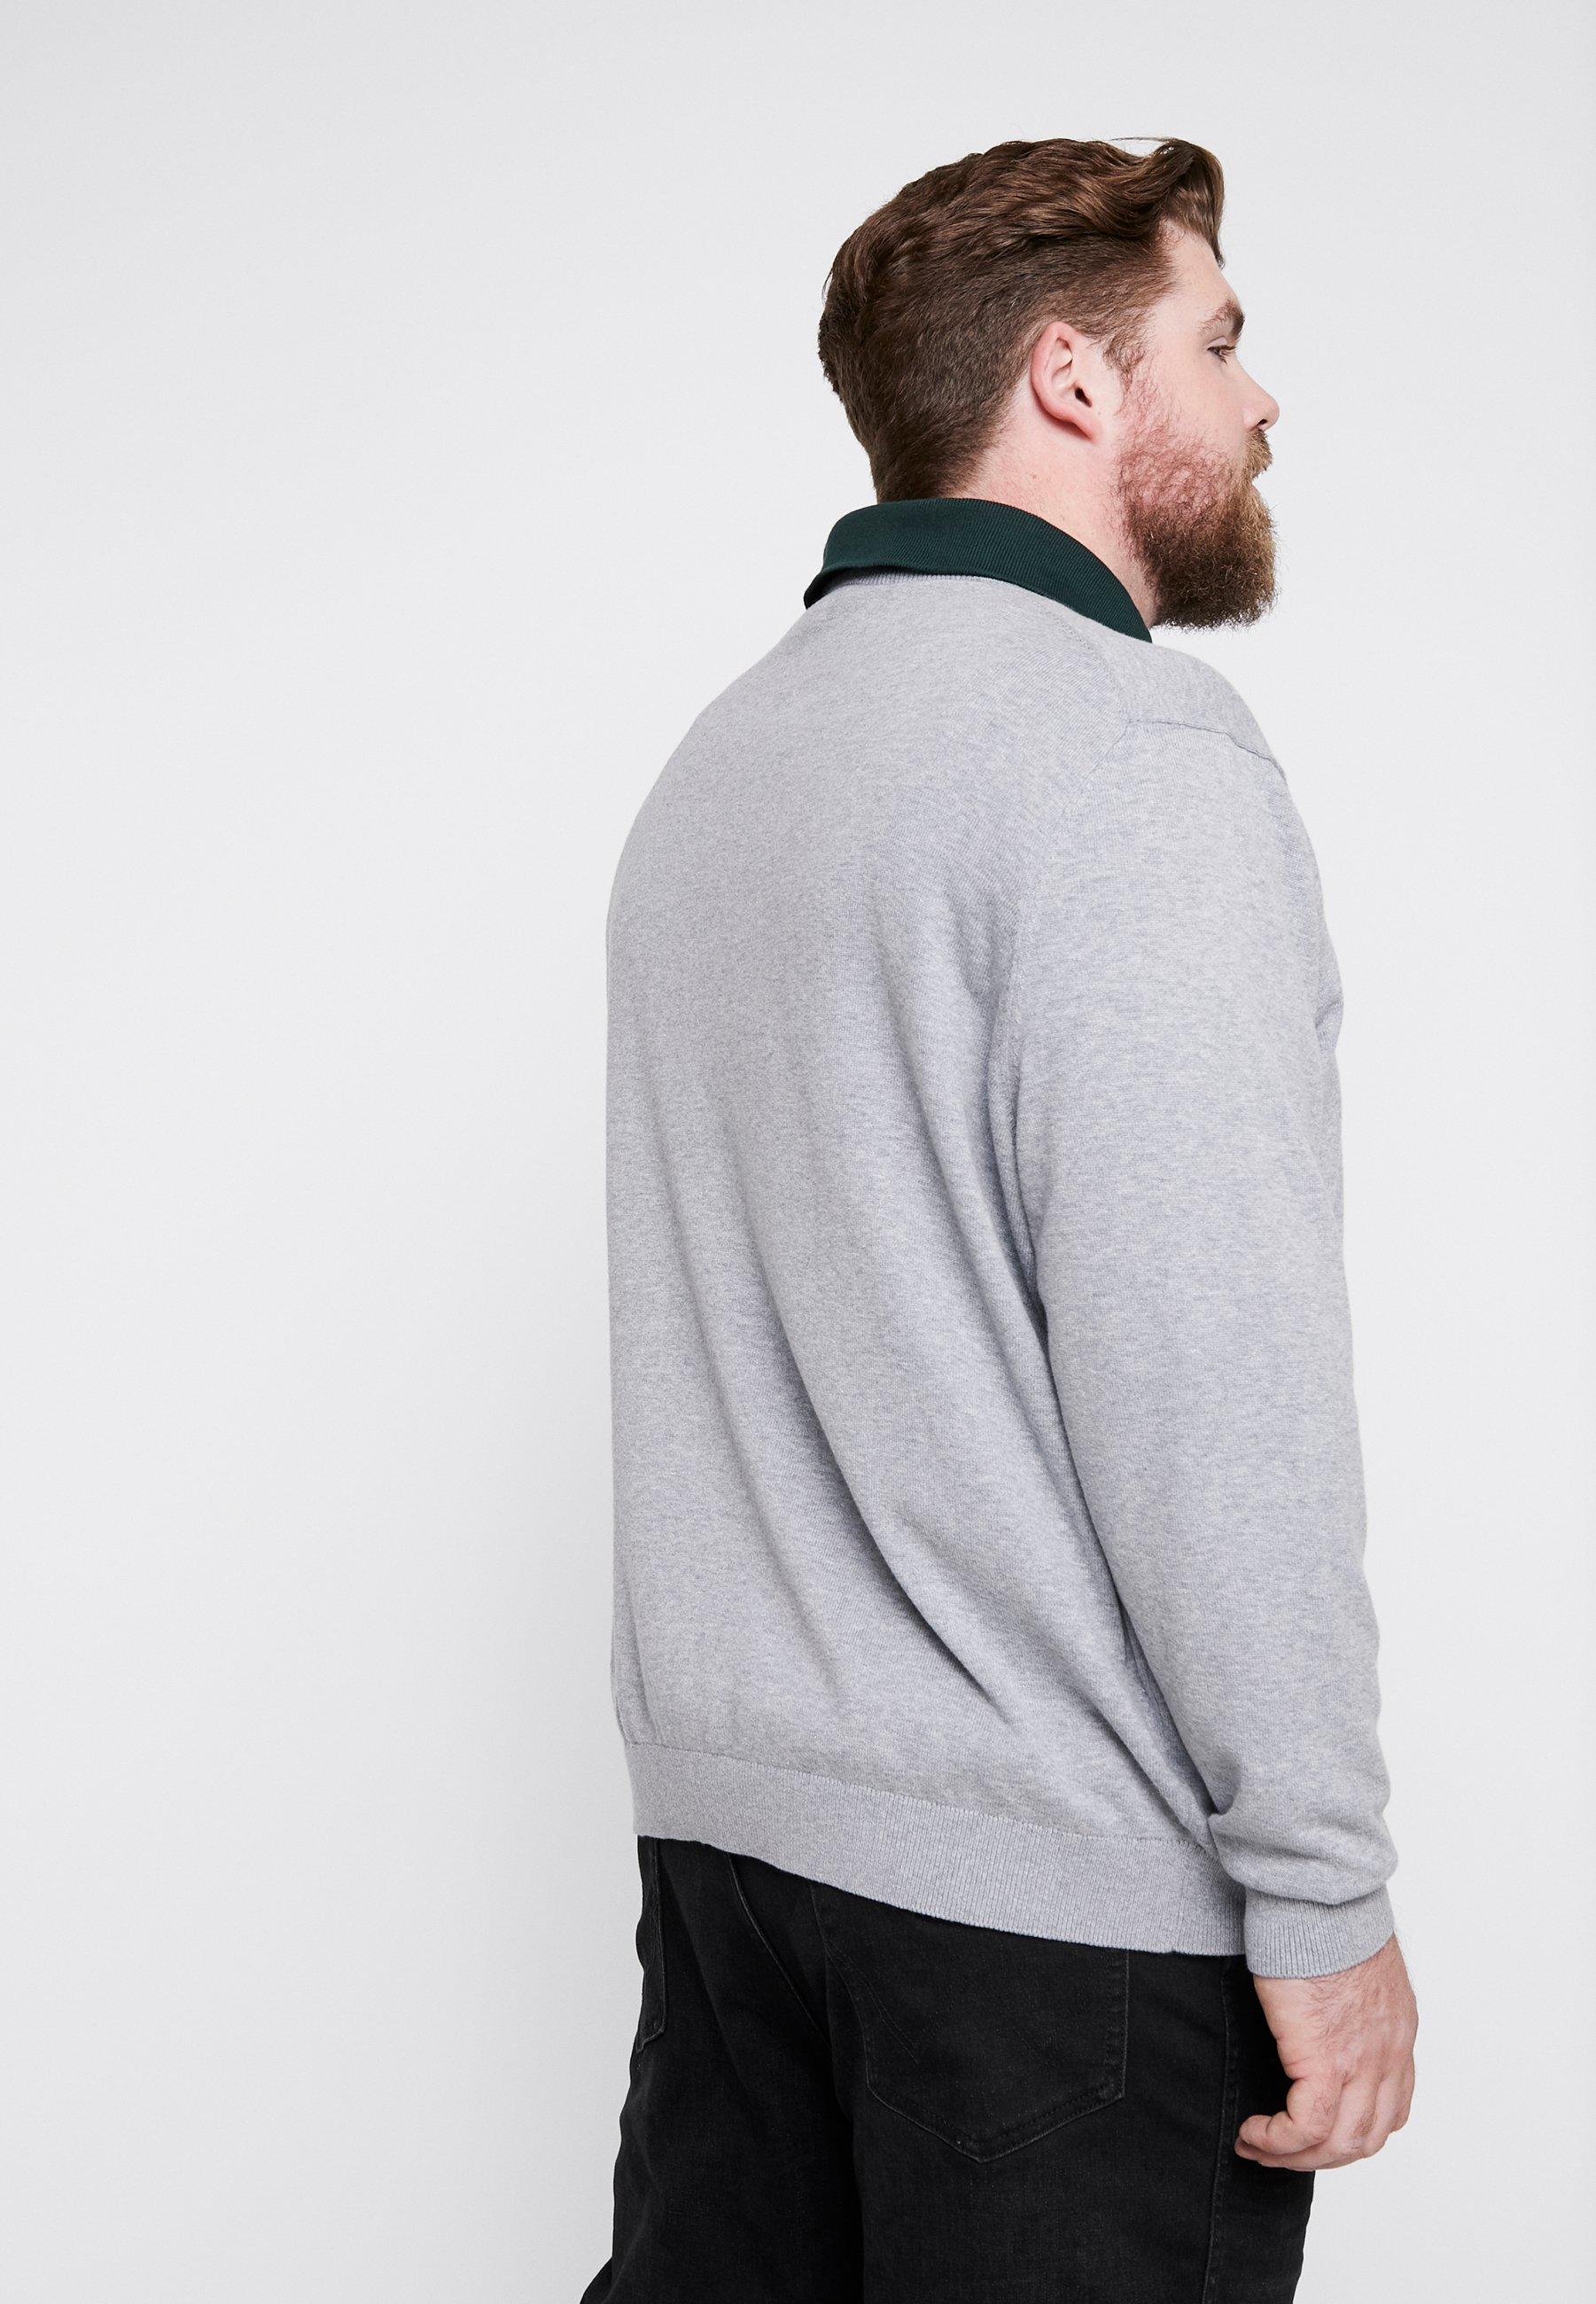 Lacoste PulloverPike PulloverPike Lacoste PulloverPike PulloverPike Lacoste Lacoste Lacoste PulloverPike PulloverPike Lacoste Lacoste 0w8nOPk